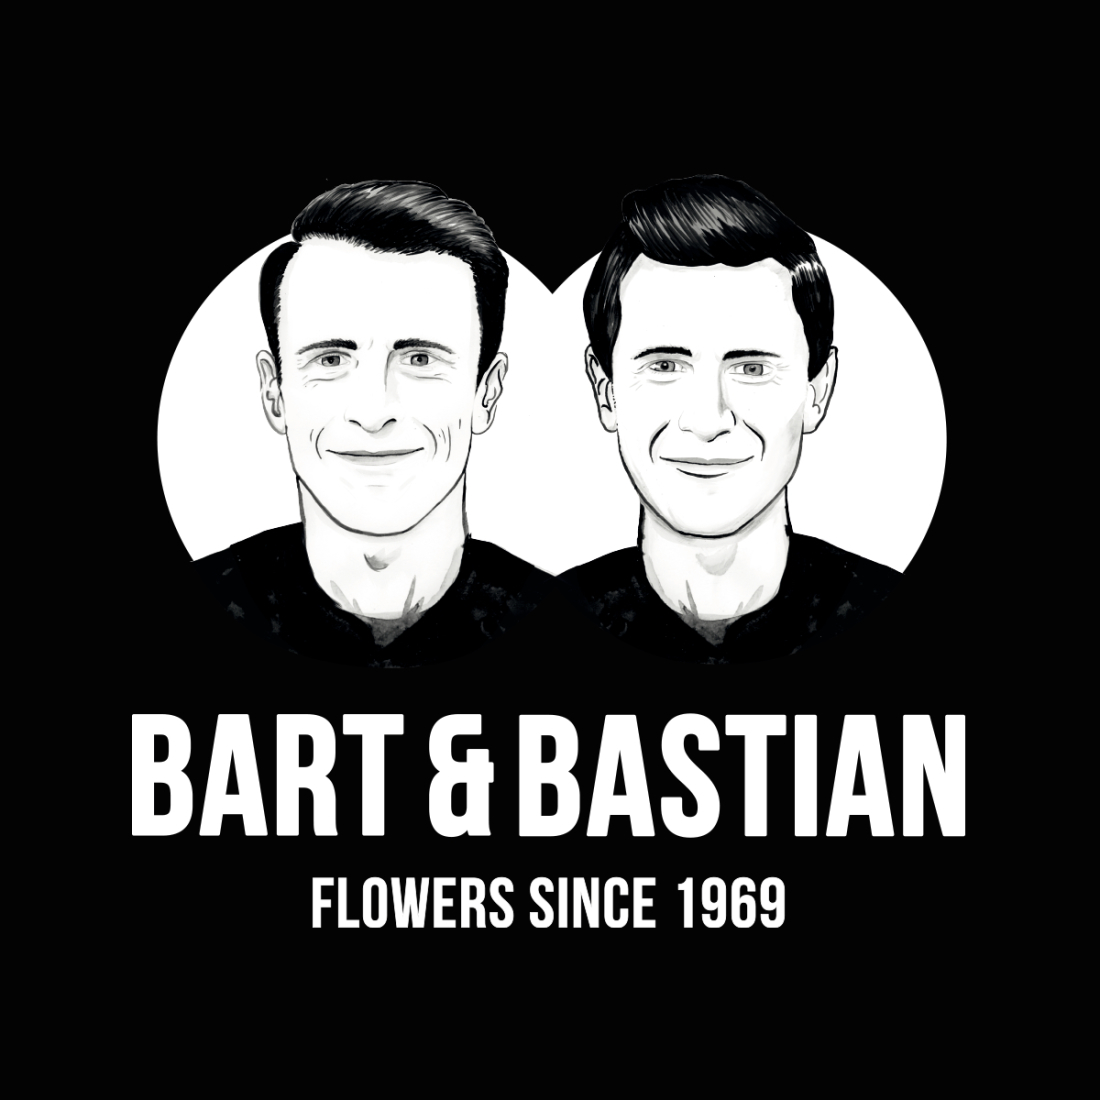 Bart & Bastian Flowers Bloemen Bedrijfsshoot